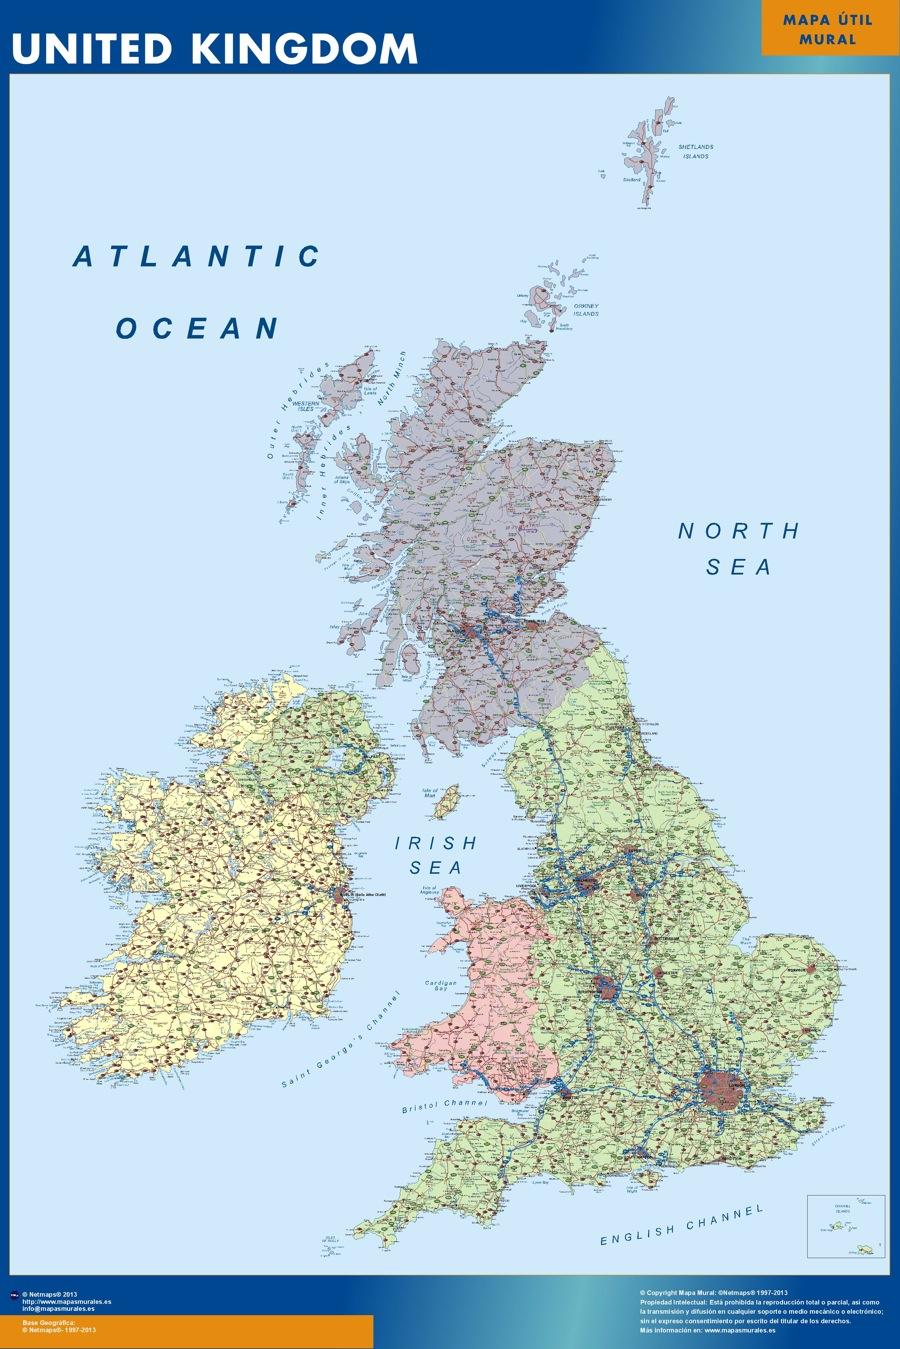 carte murale royaume uni